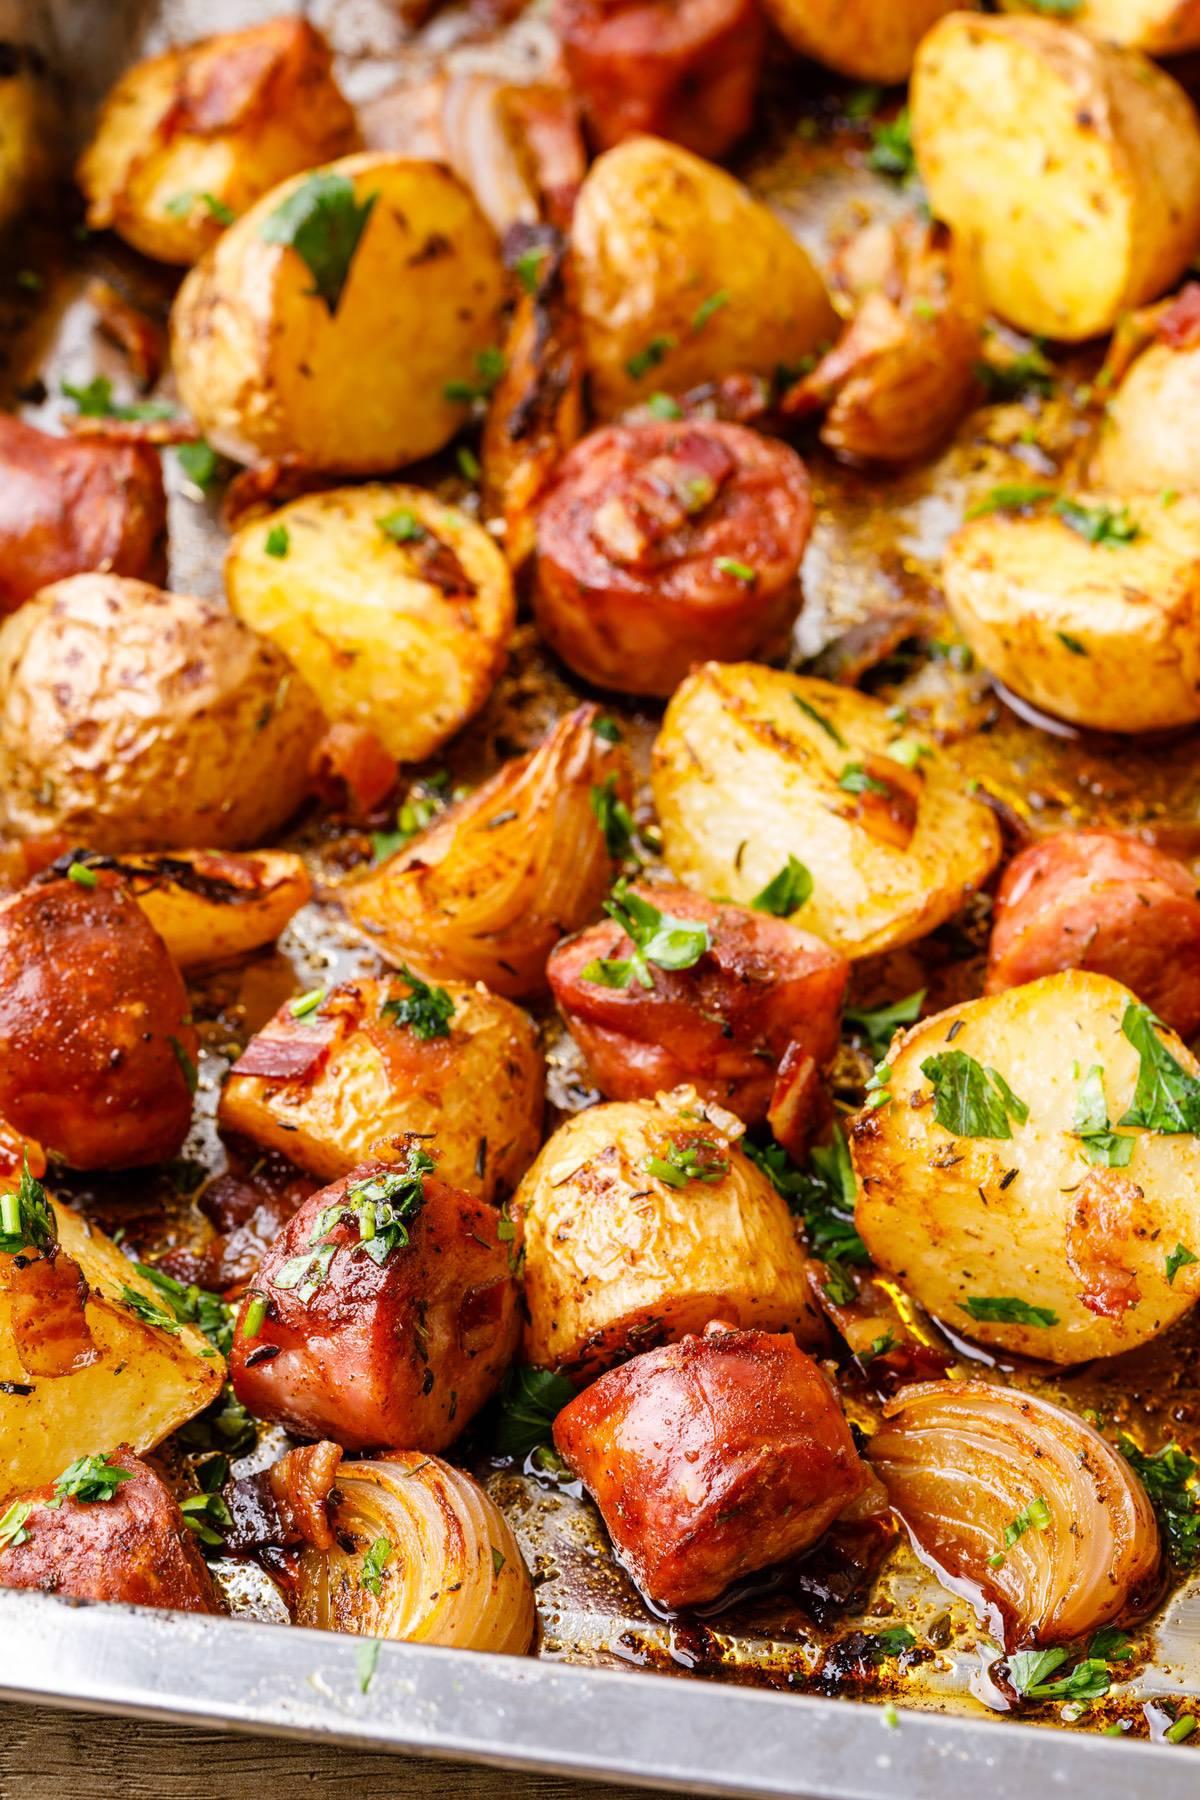 Baked Sheet Pan Sausage And Potatoes Recipe